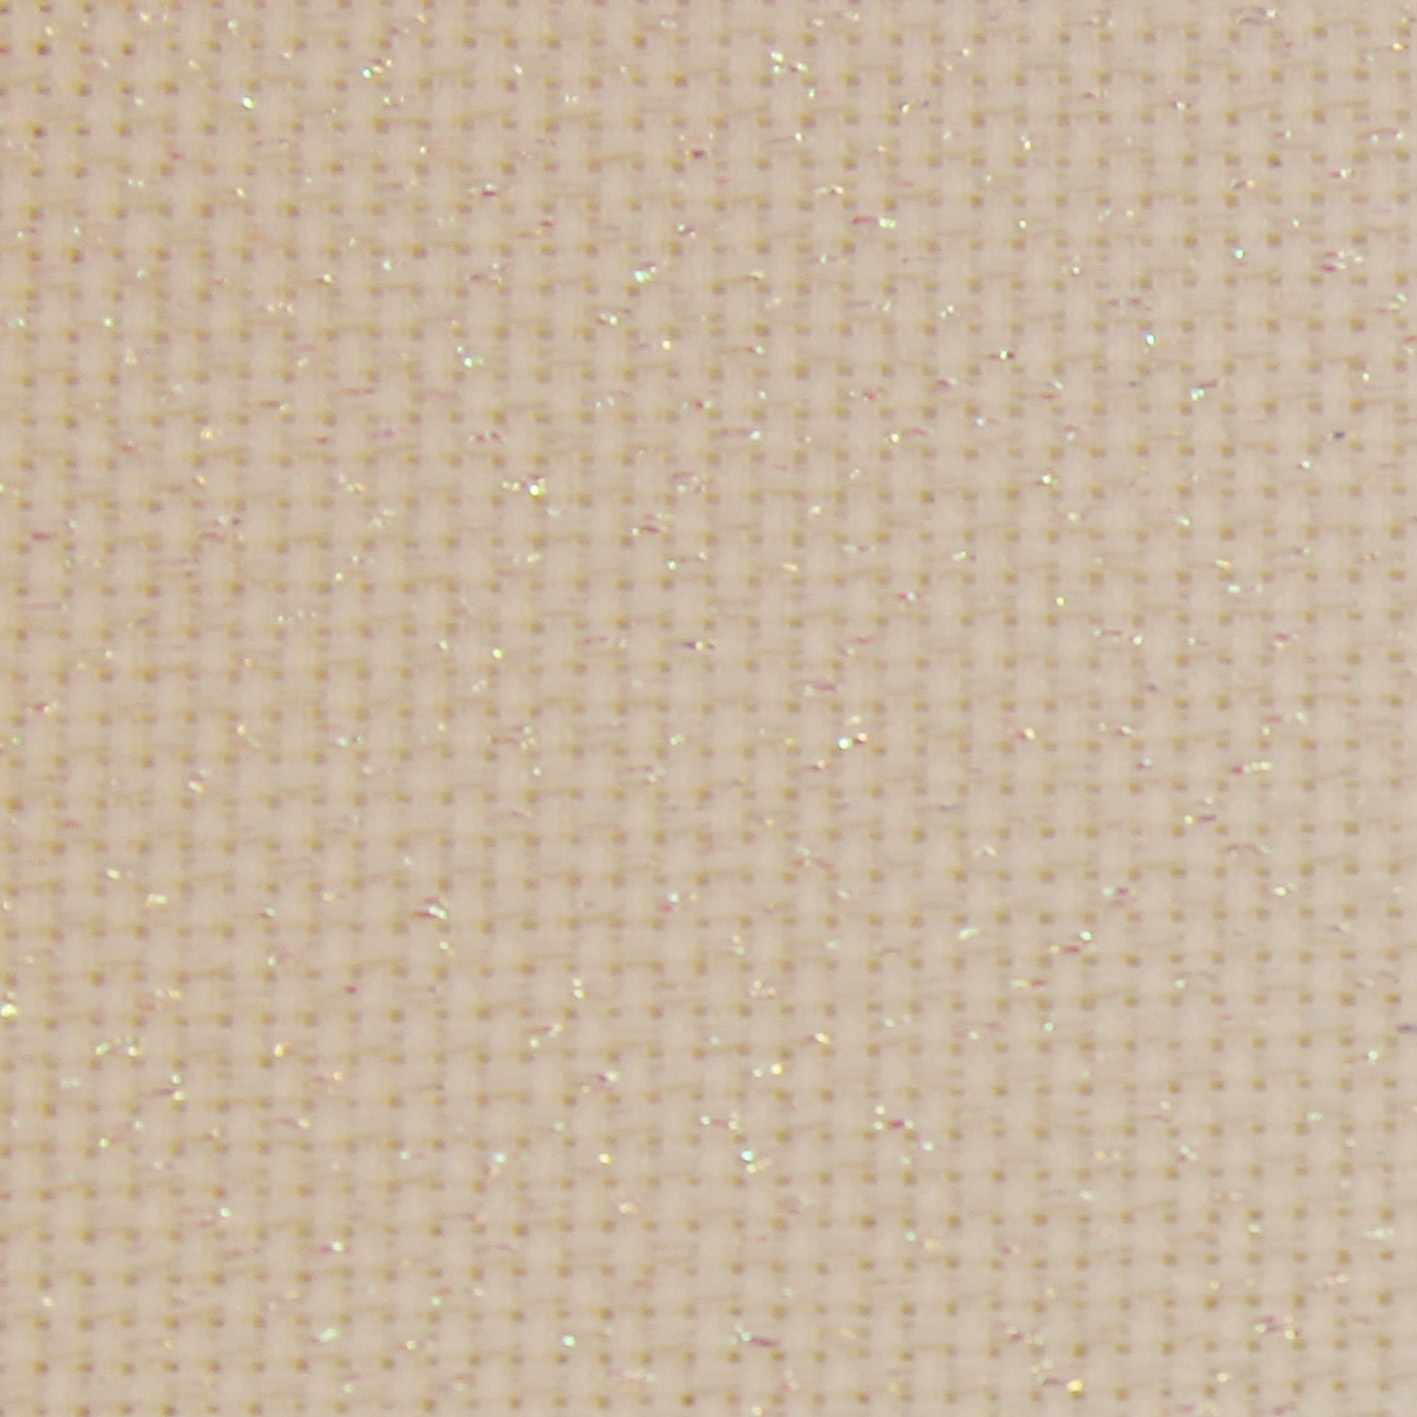 3706 Stern Aida (100% хлопок)  цвет 11, шир 110 14ct-54кл/10см